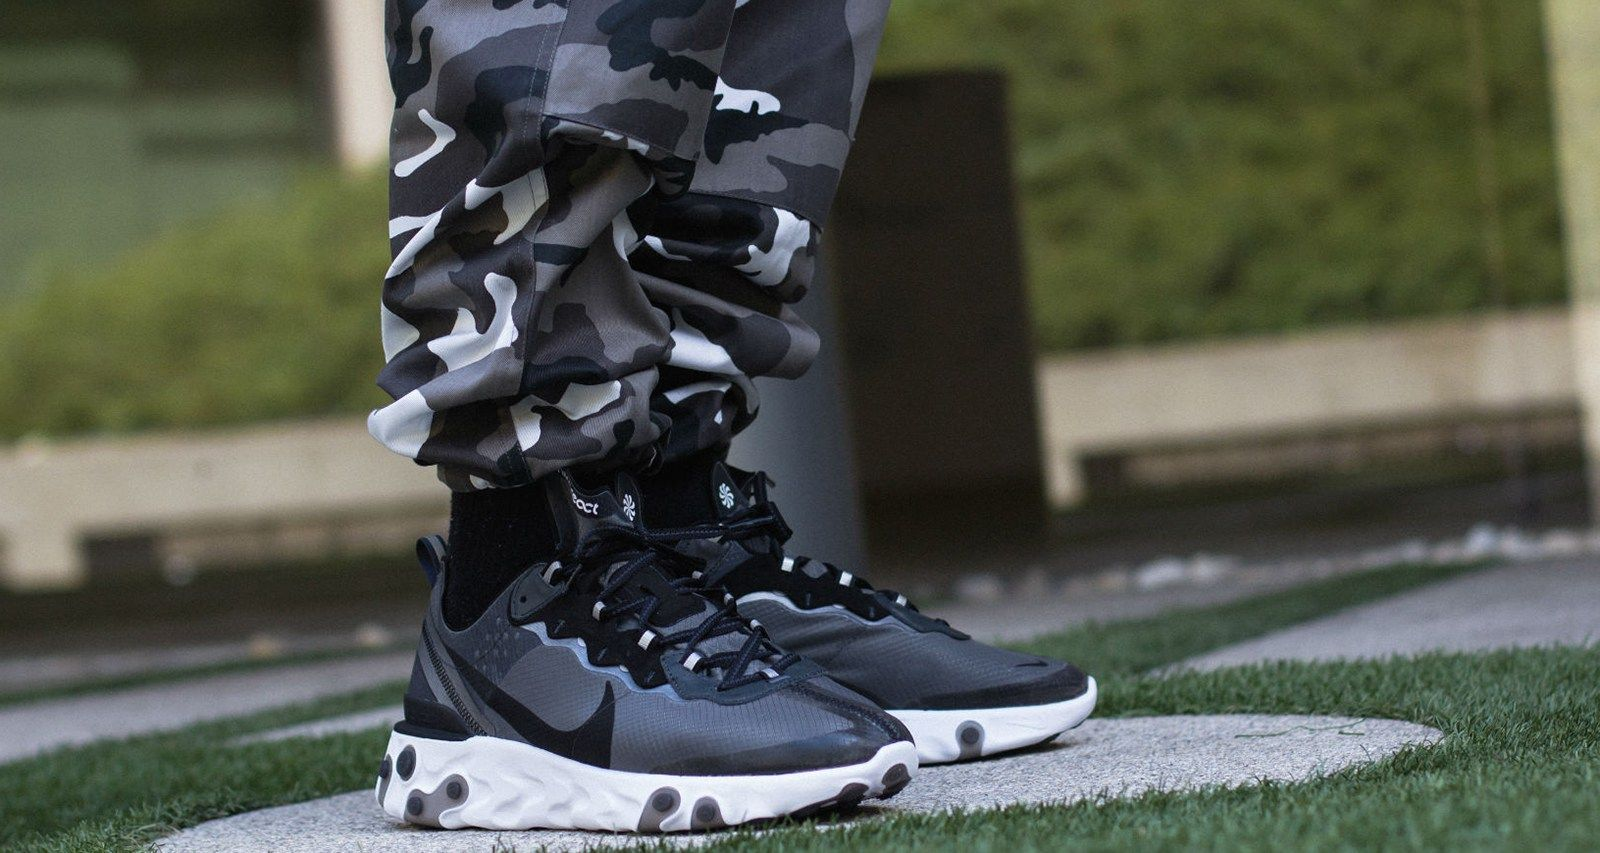 Nike React Element 87 Anthracite/Black